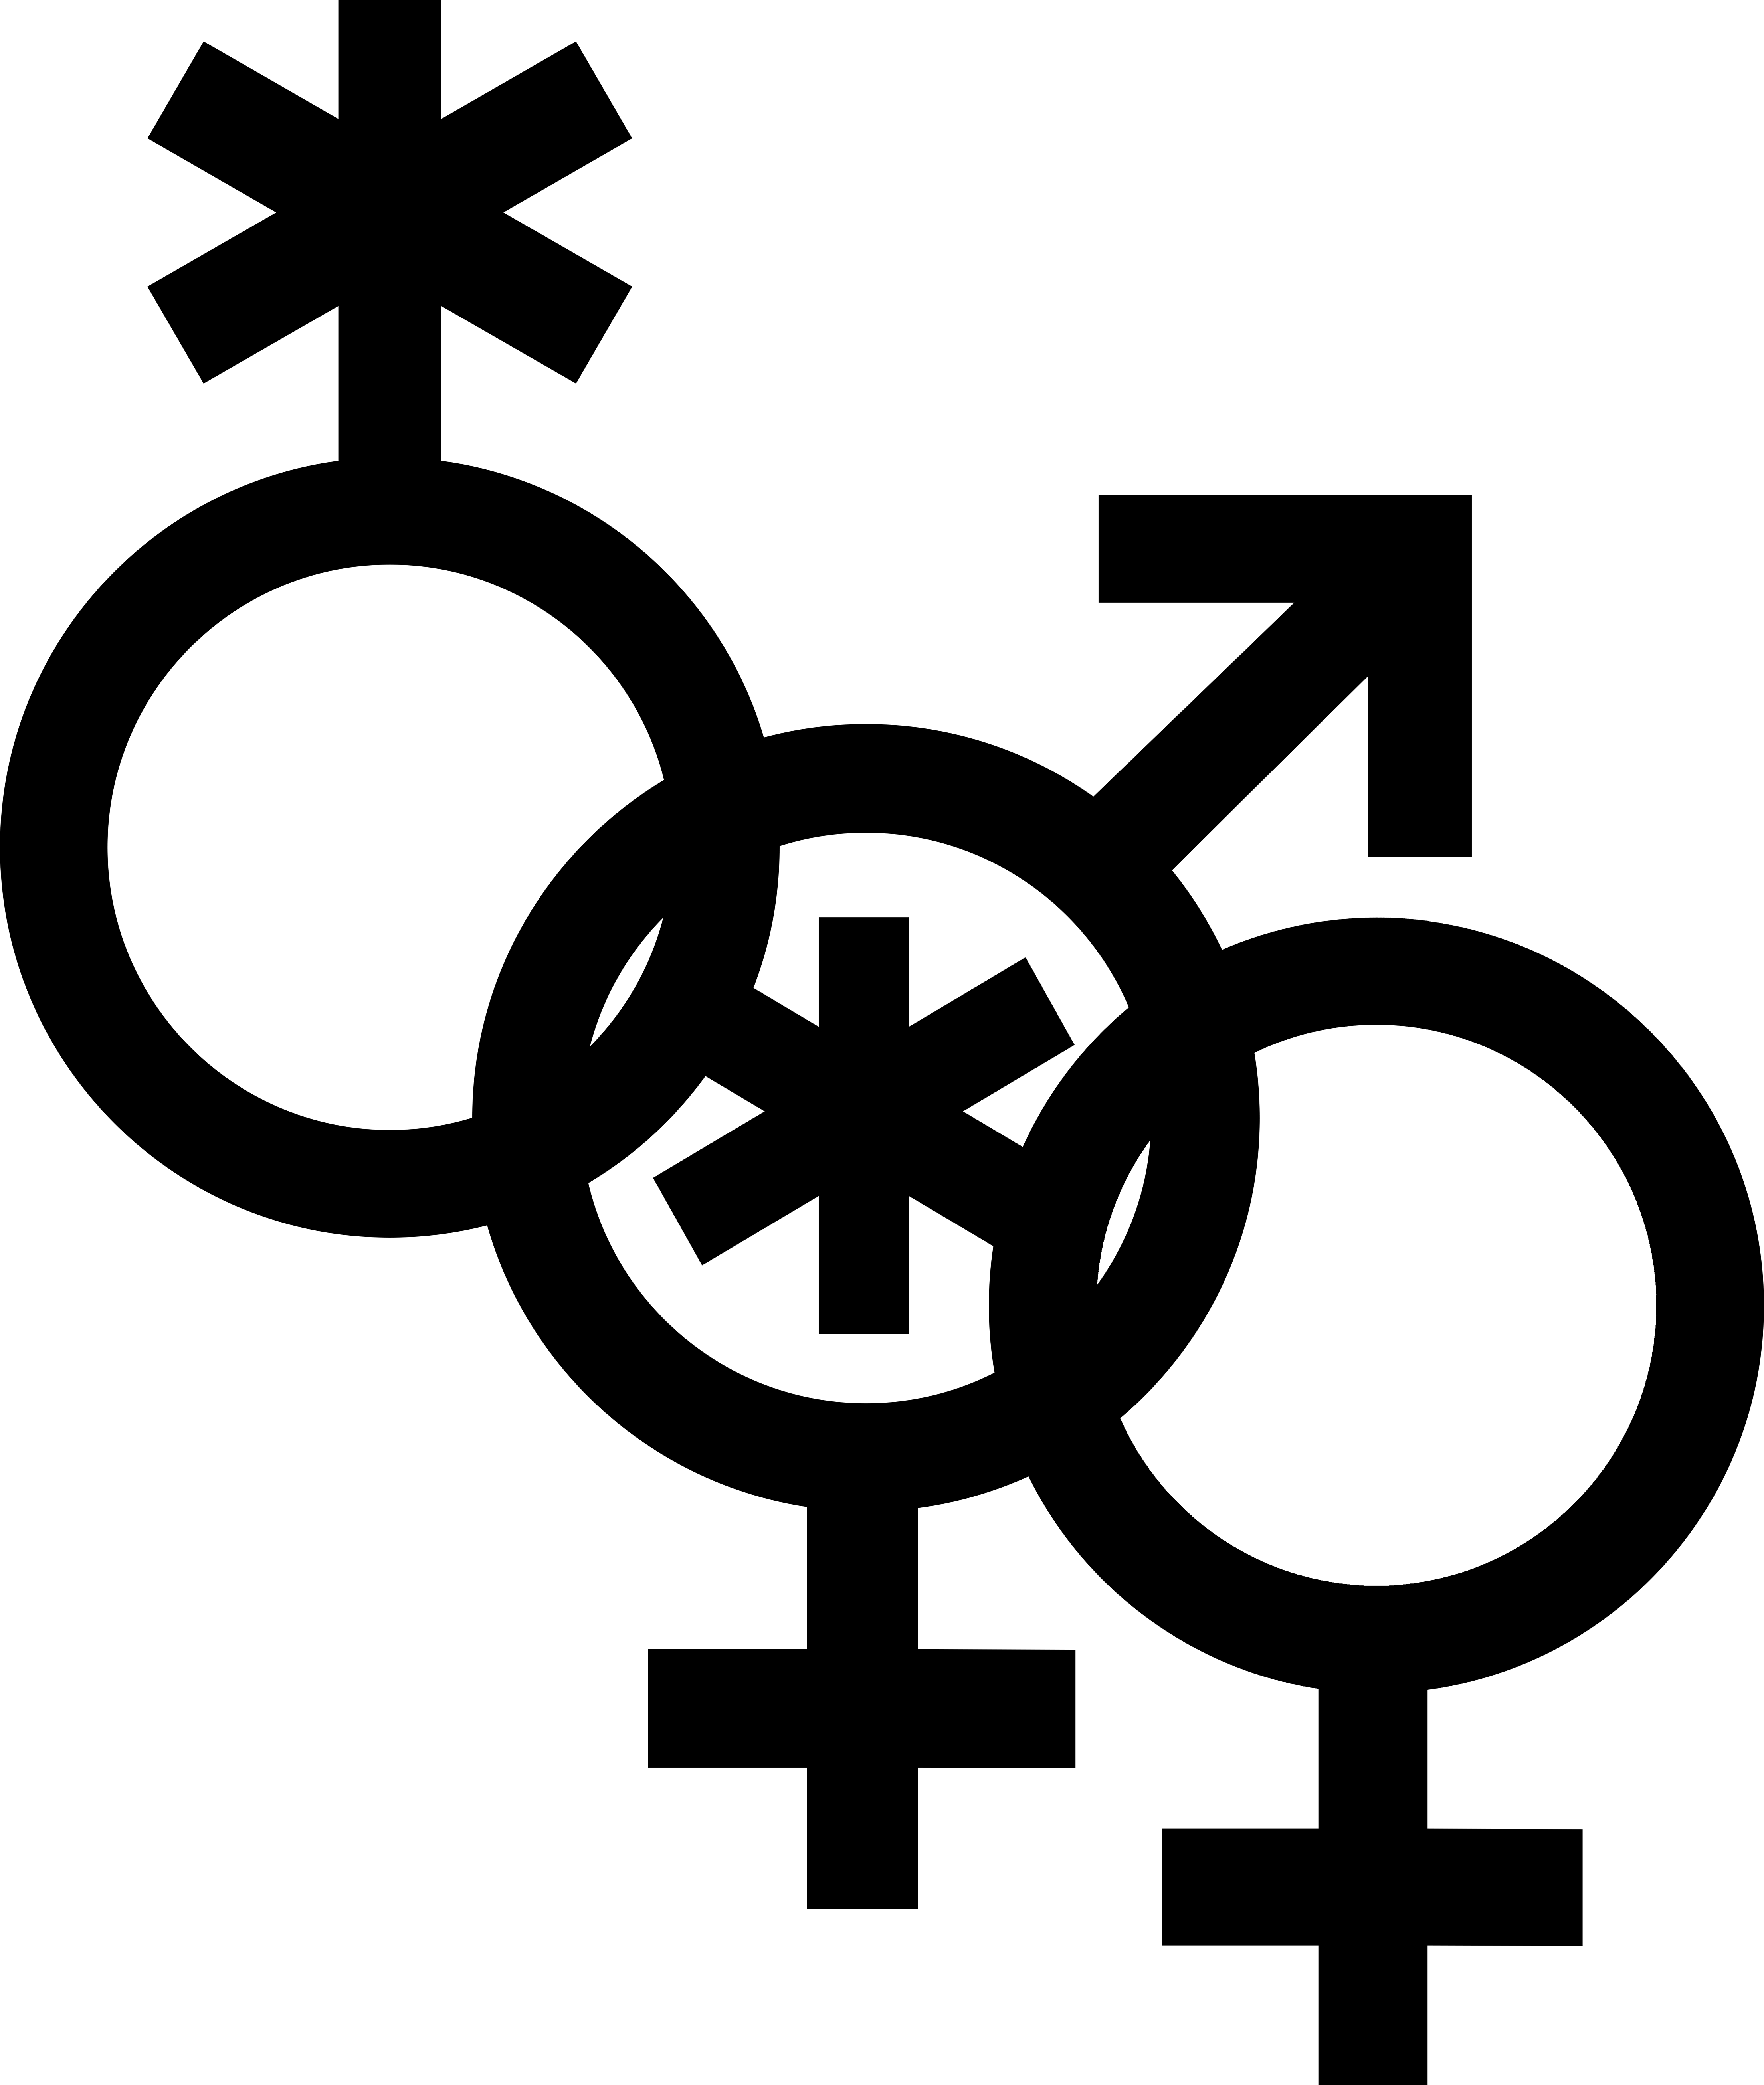 Nonbinary man and woman symbol interlocked with nonbinary symbol and a Venus symbol.